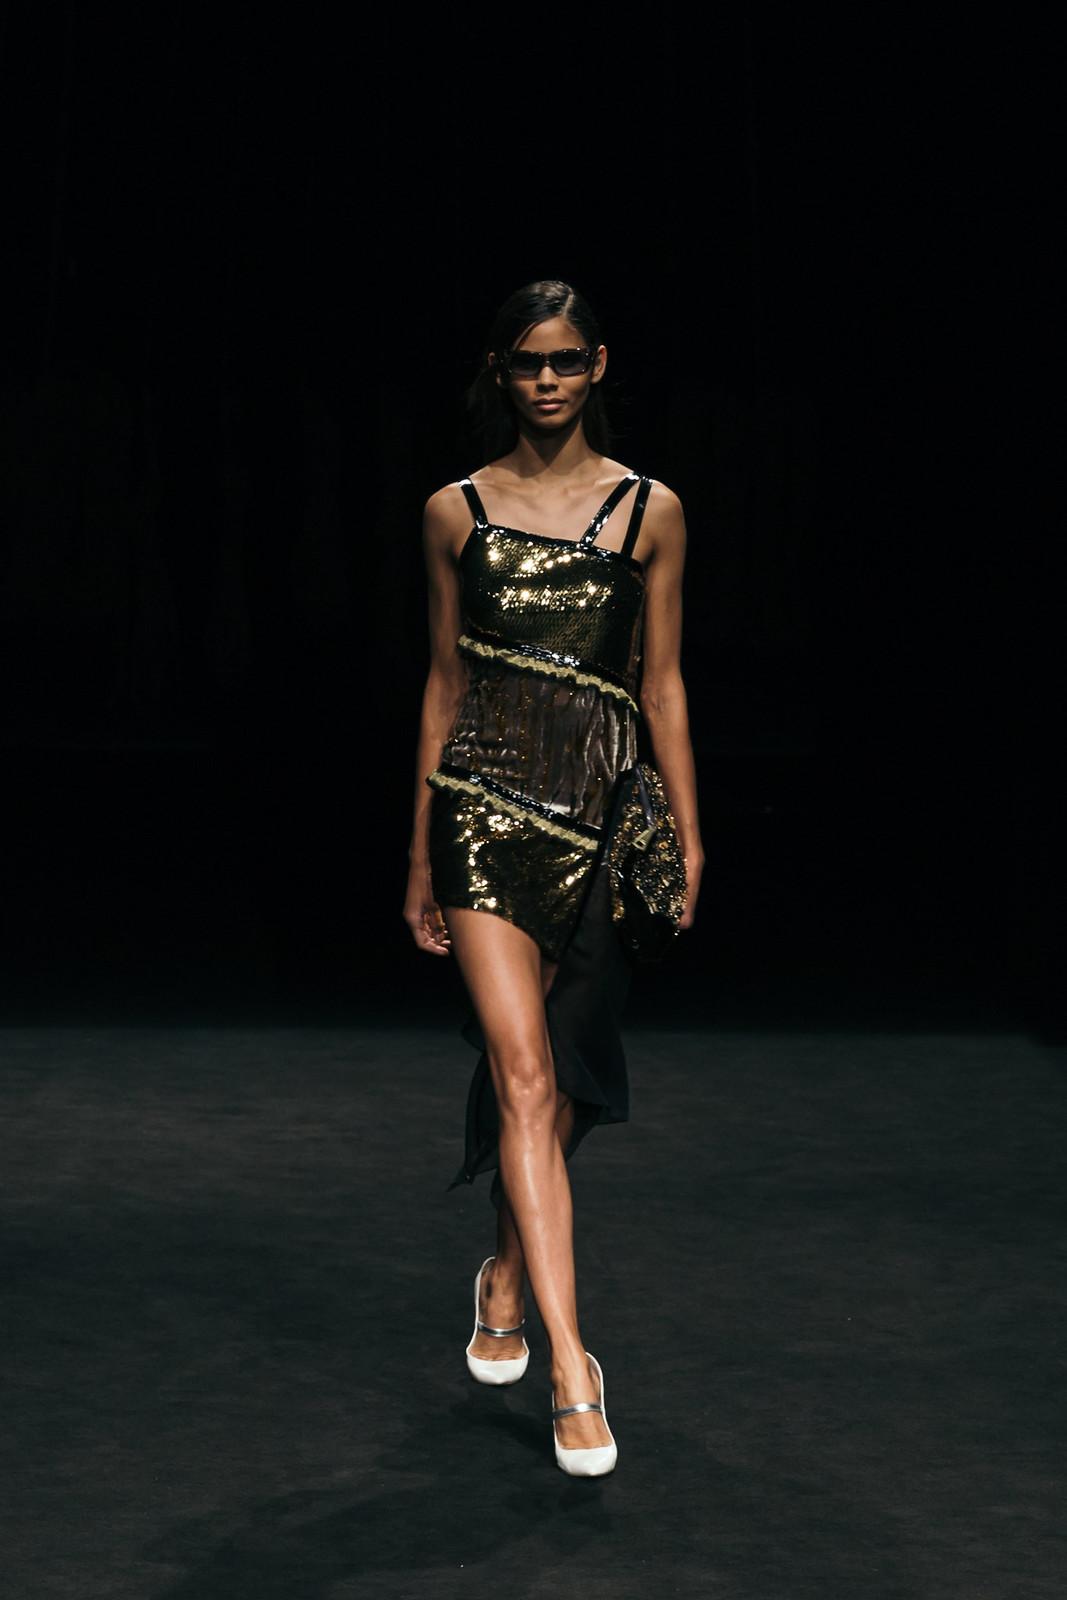 Jessie Chanes - Seams for a desire - 080 Bacelona Fashion #080bcnfasion -20